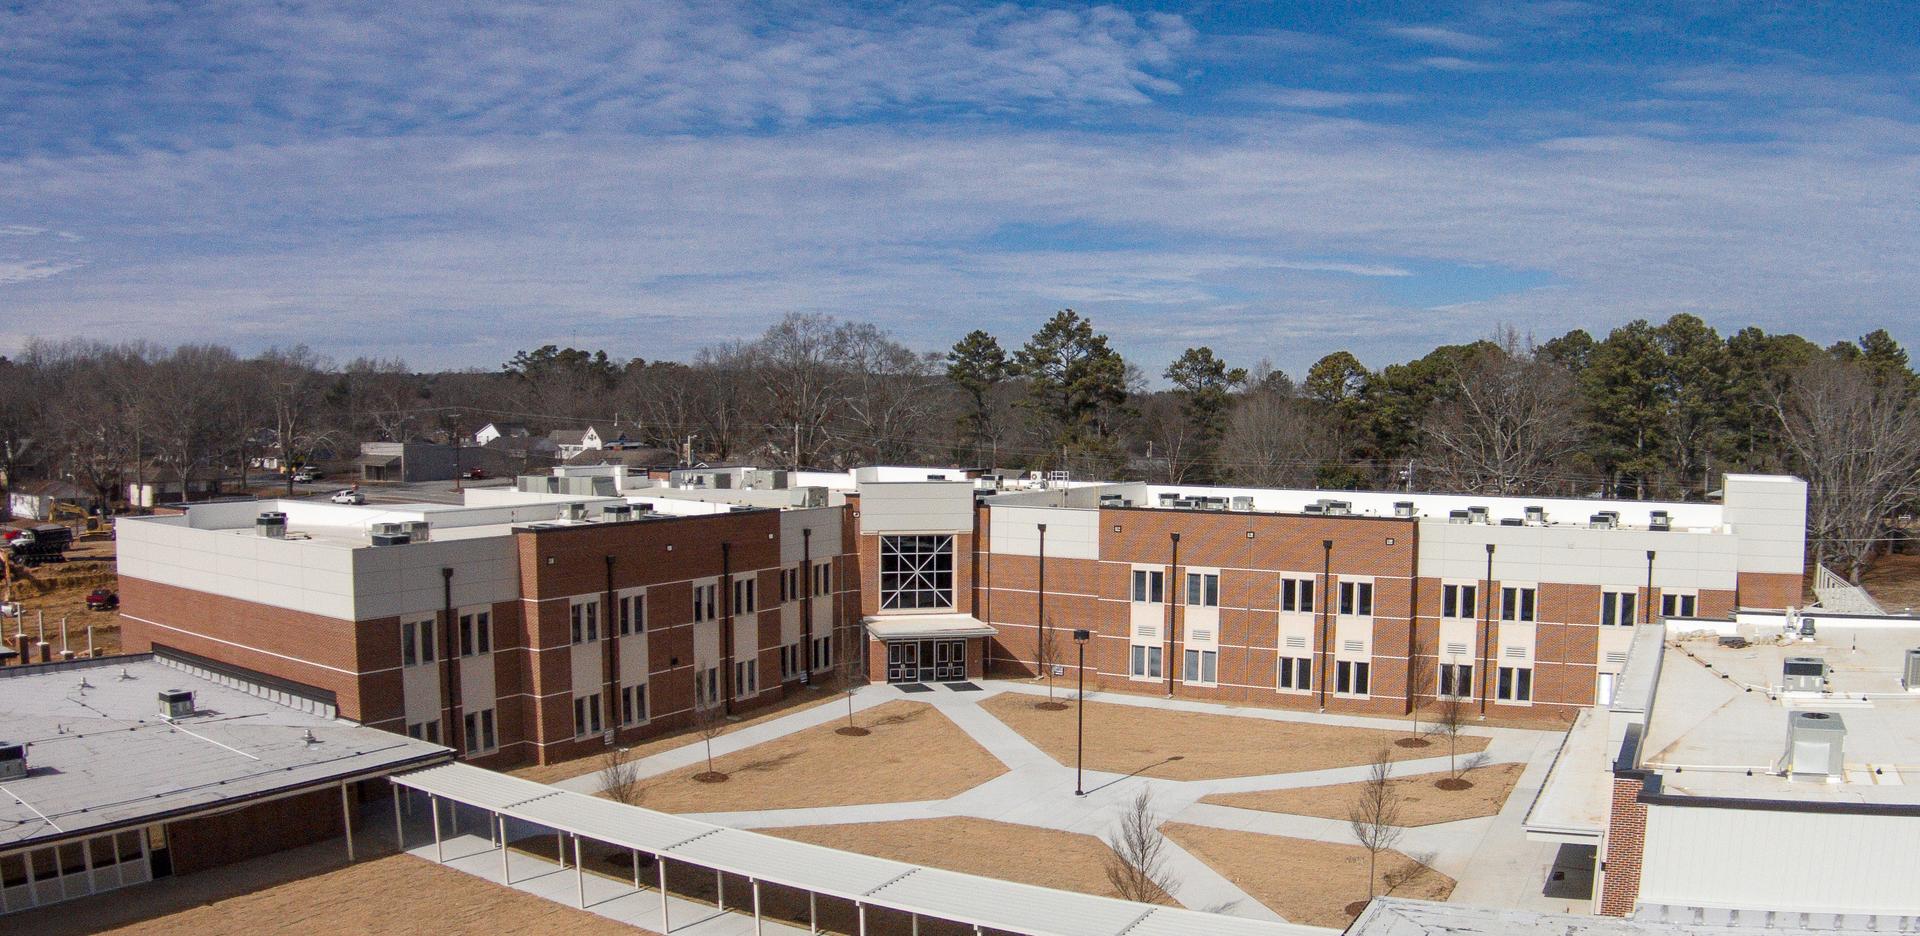 The new Cullman High School